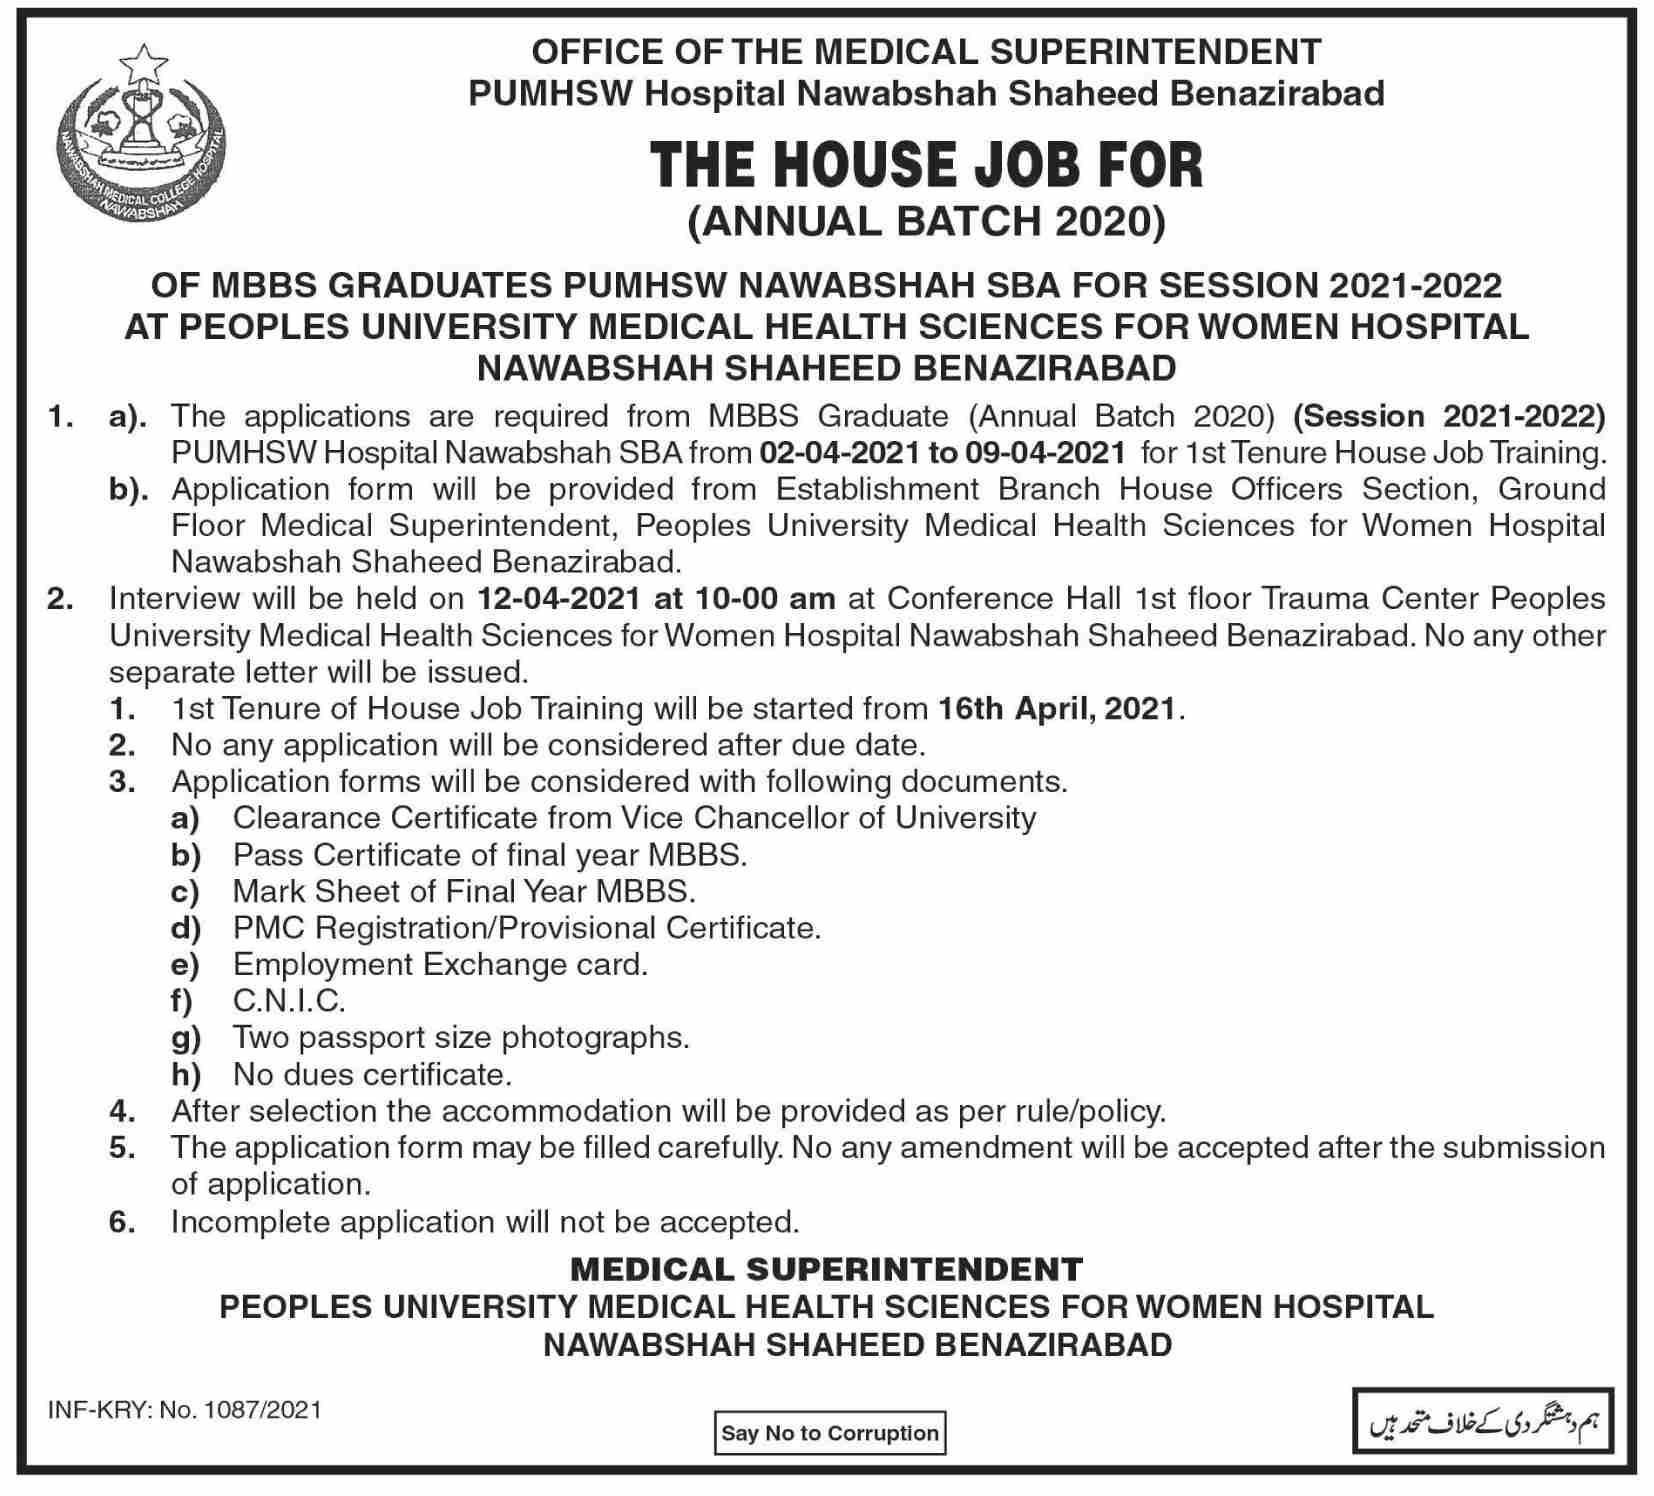 Latest Jobs 2021 in Peoples University Medical Health Sciences for Women (PUMHSW) Hospital Nawabshah